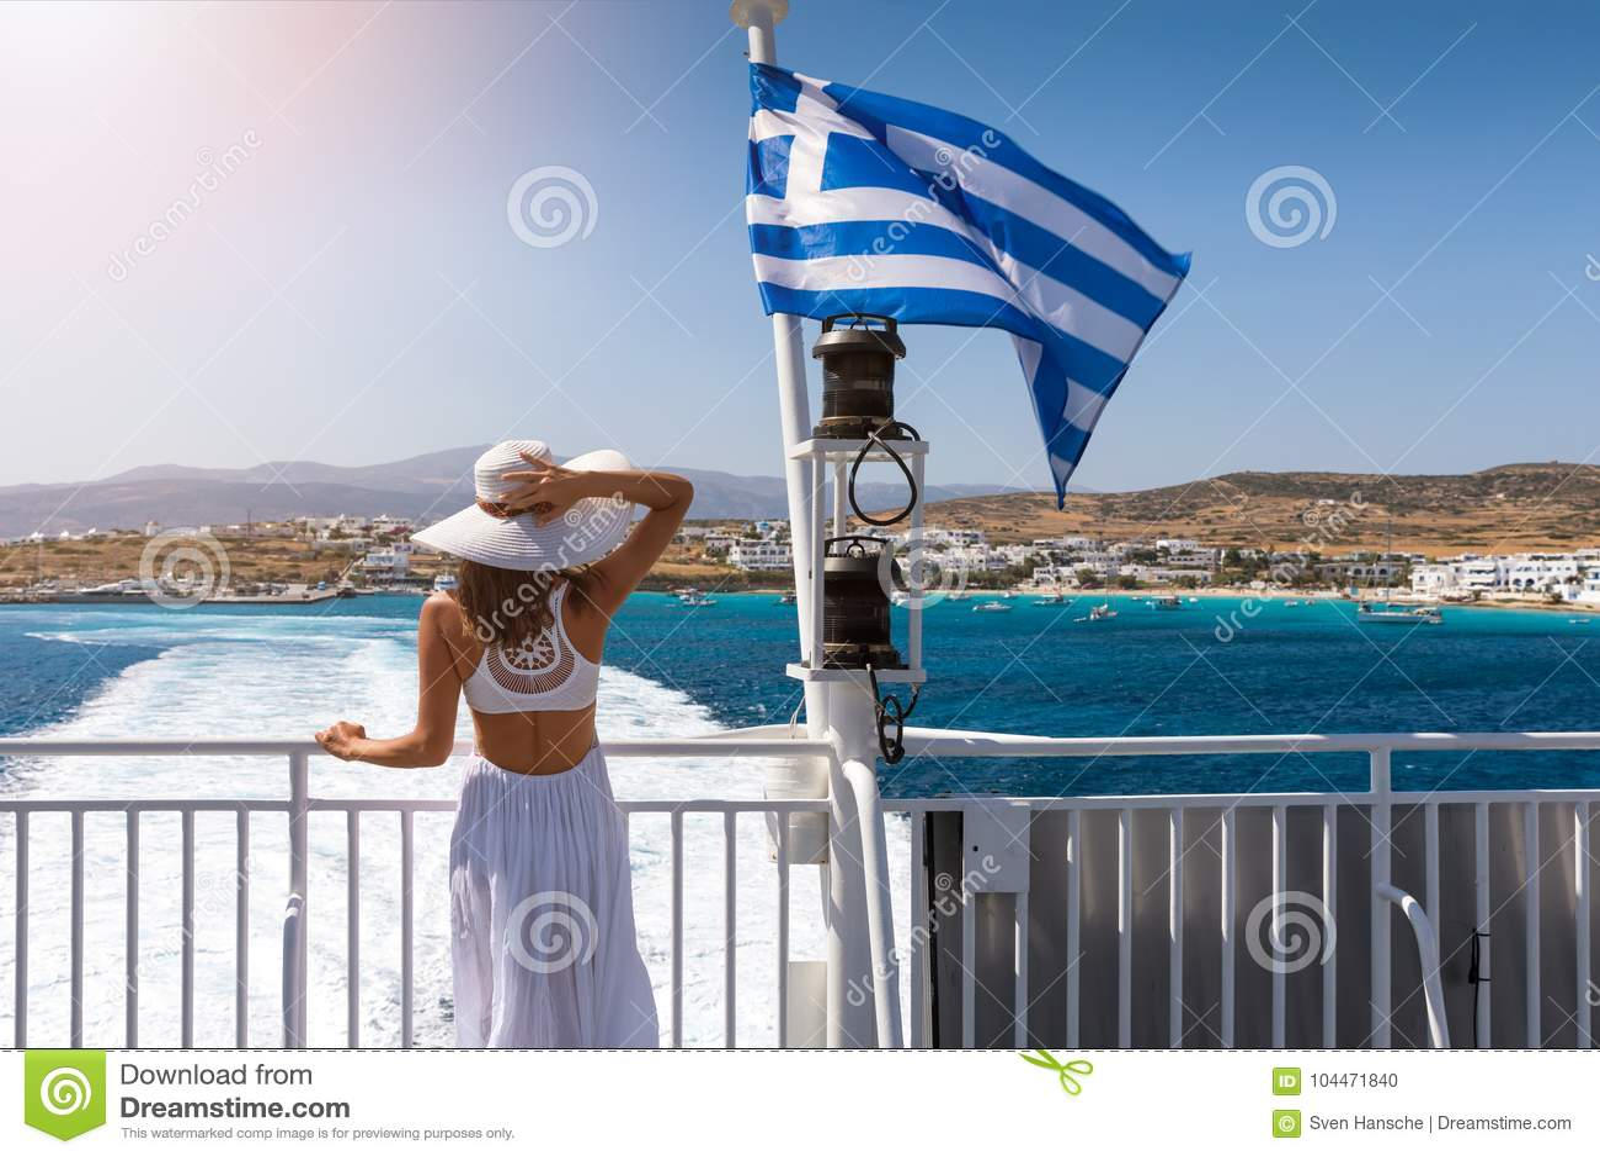 Woman on a ferry boat in the aegean sea, Greece